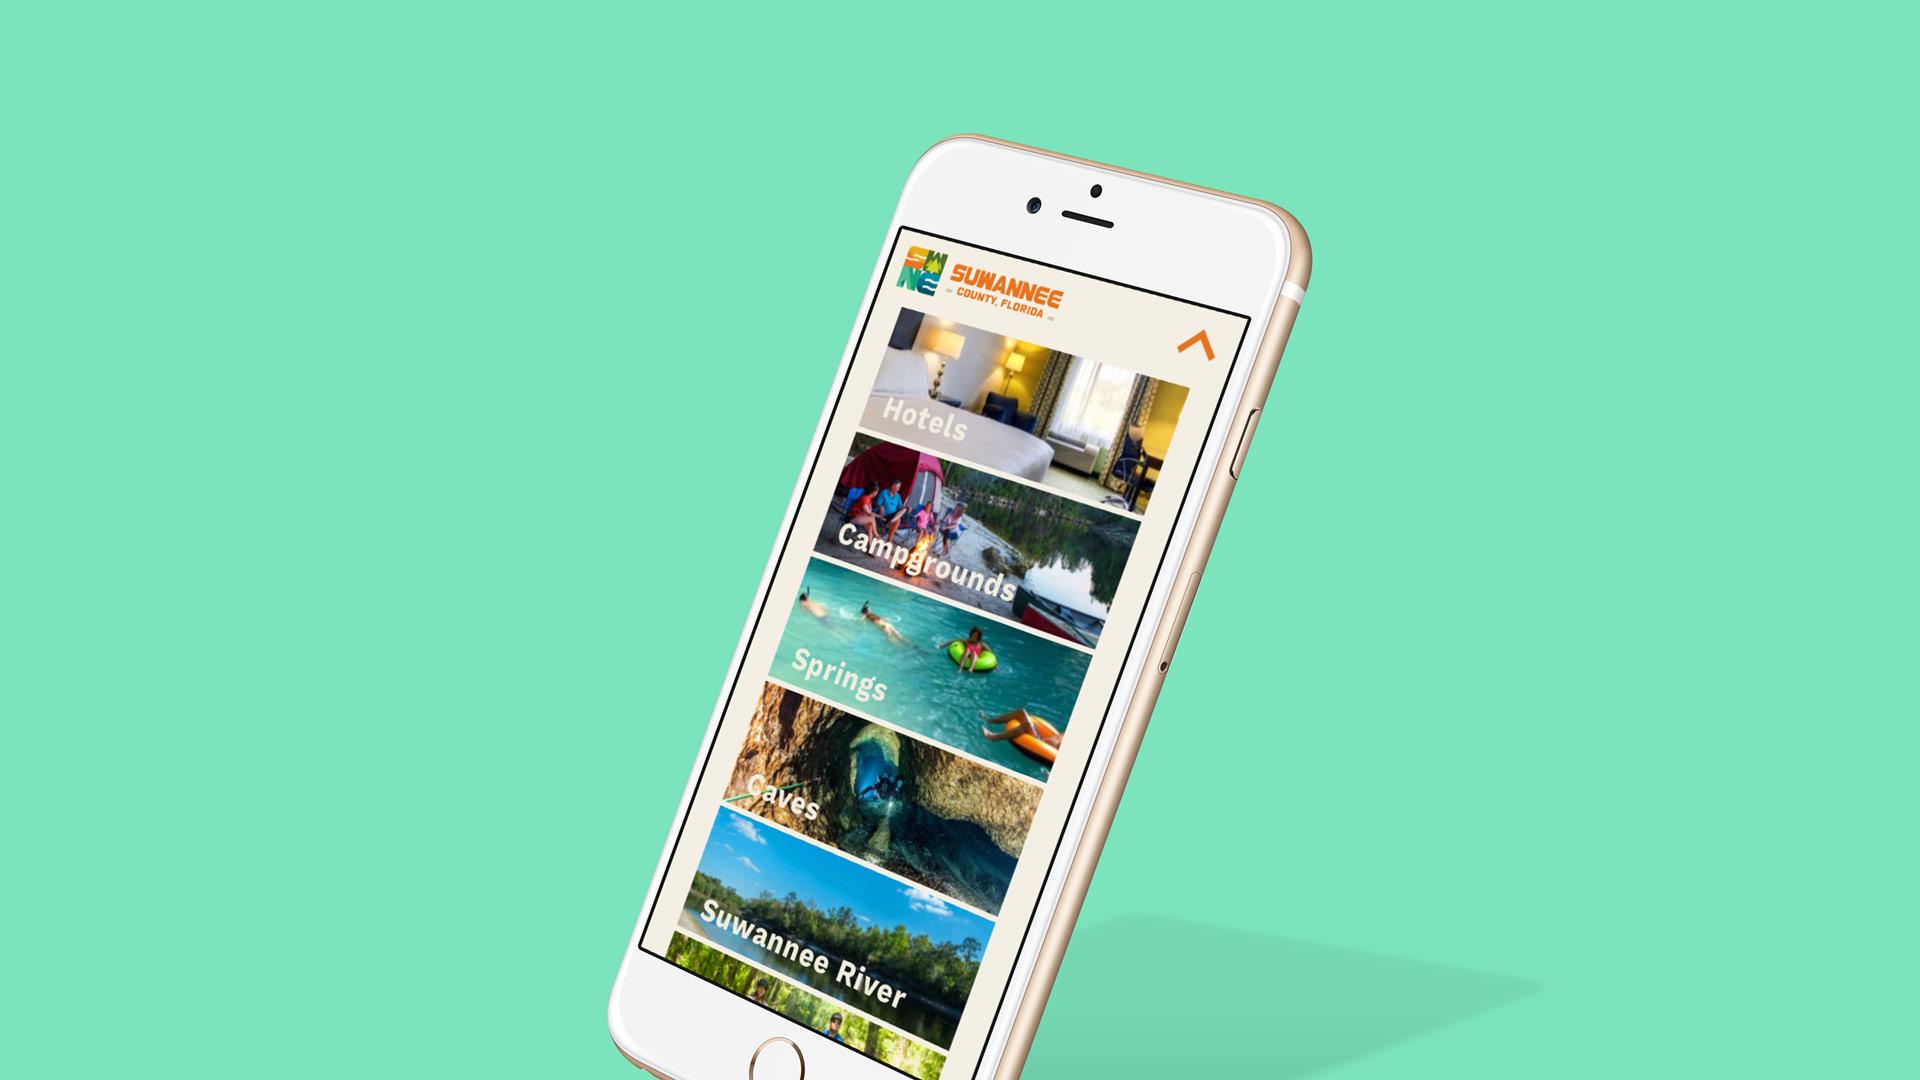 Phone displaying Suwannee County website